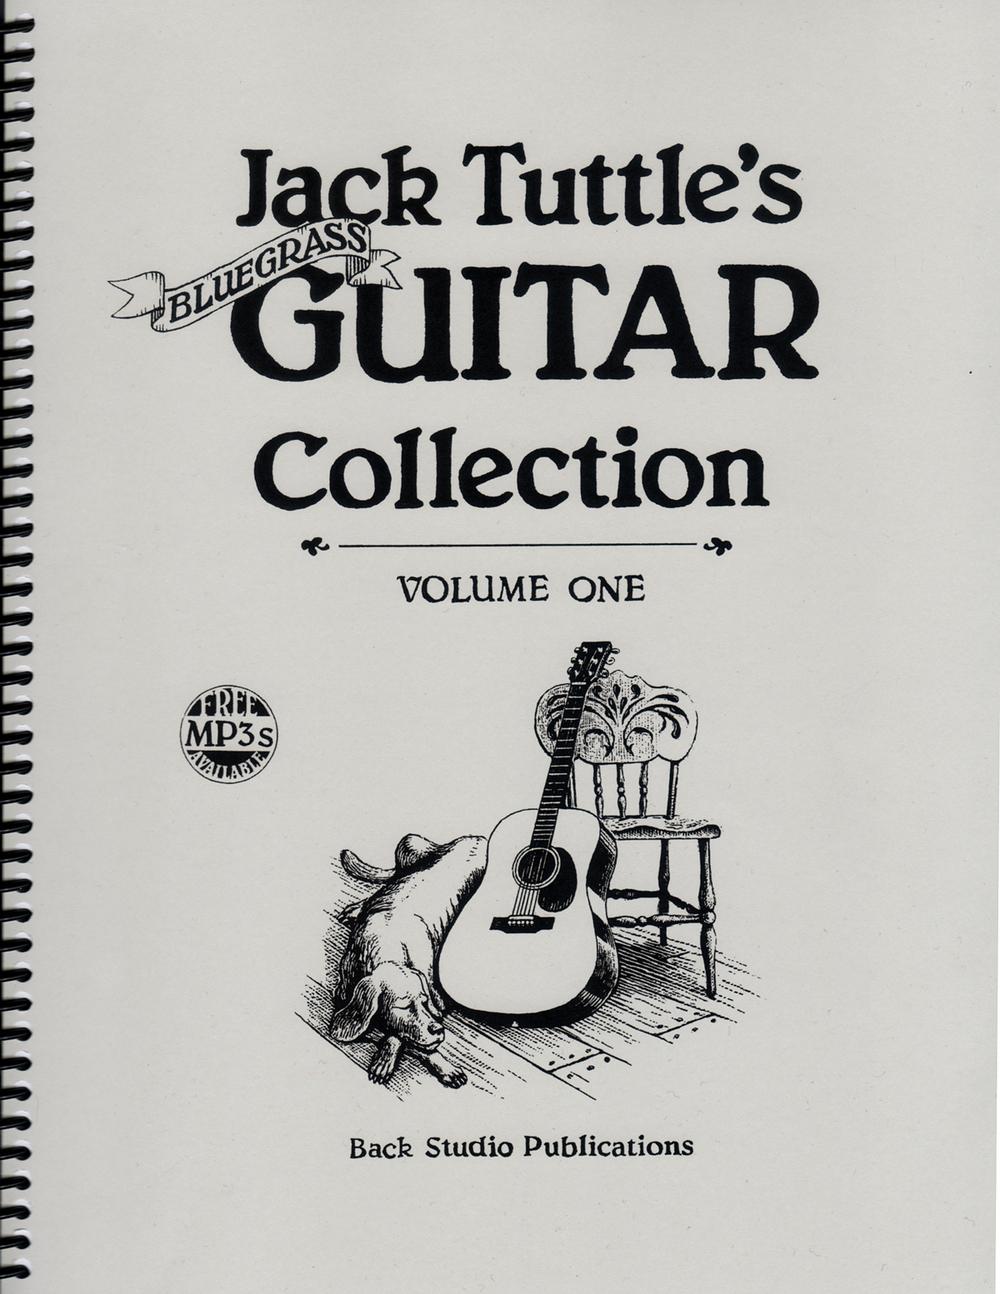 Jack Tuttle's Bluegrass Guitar Collection, Vol. 1